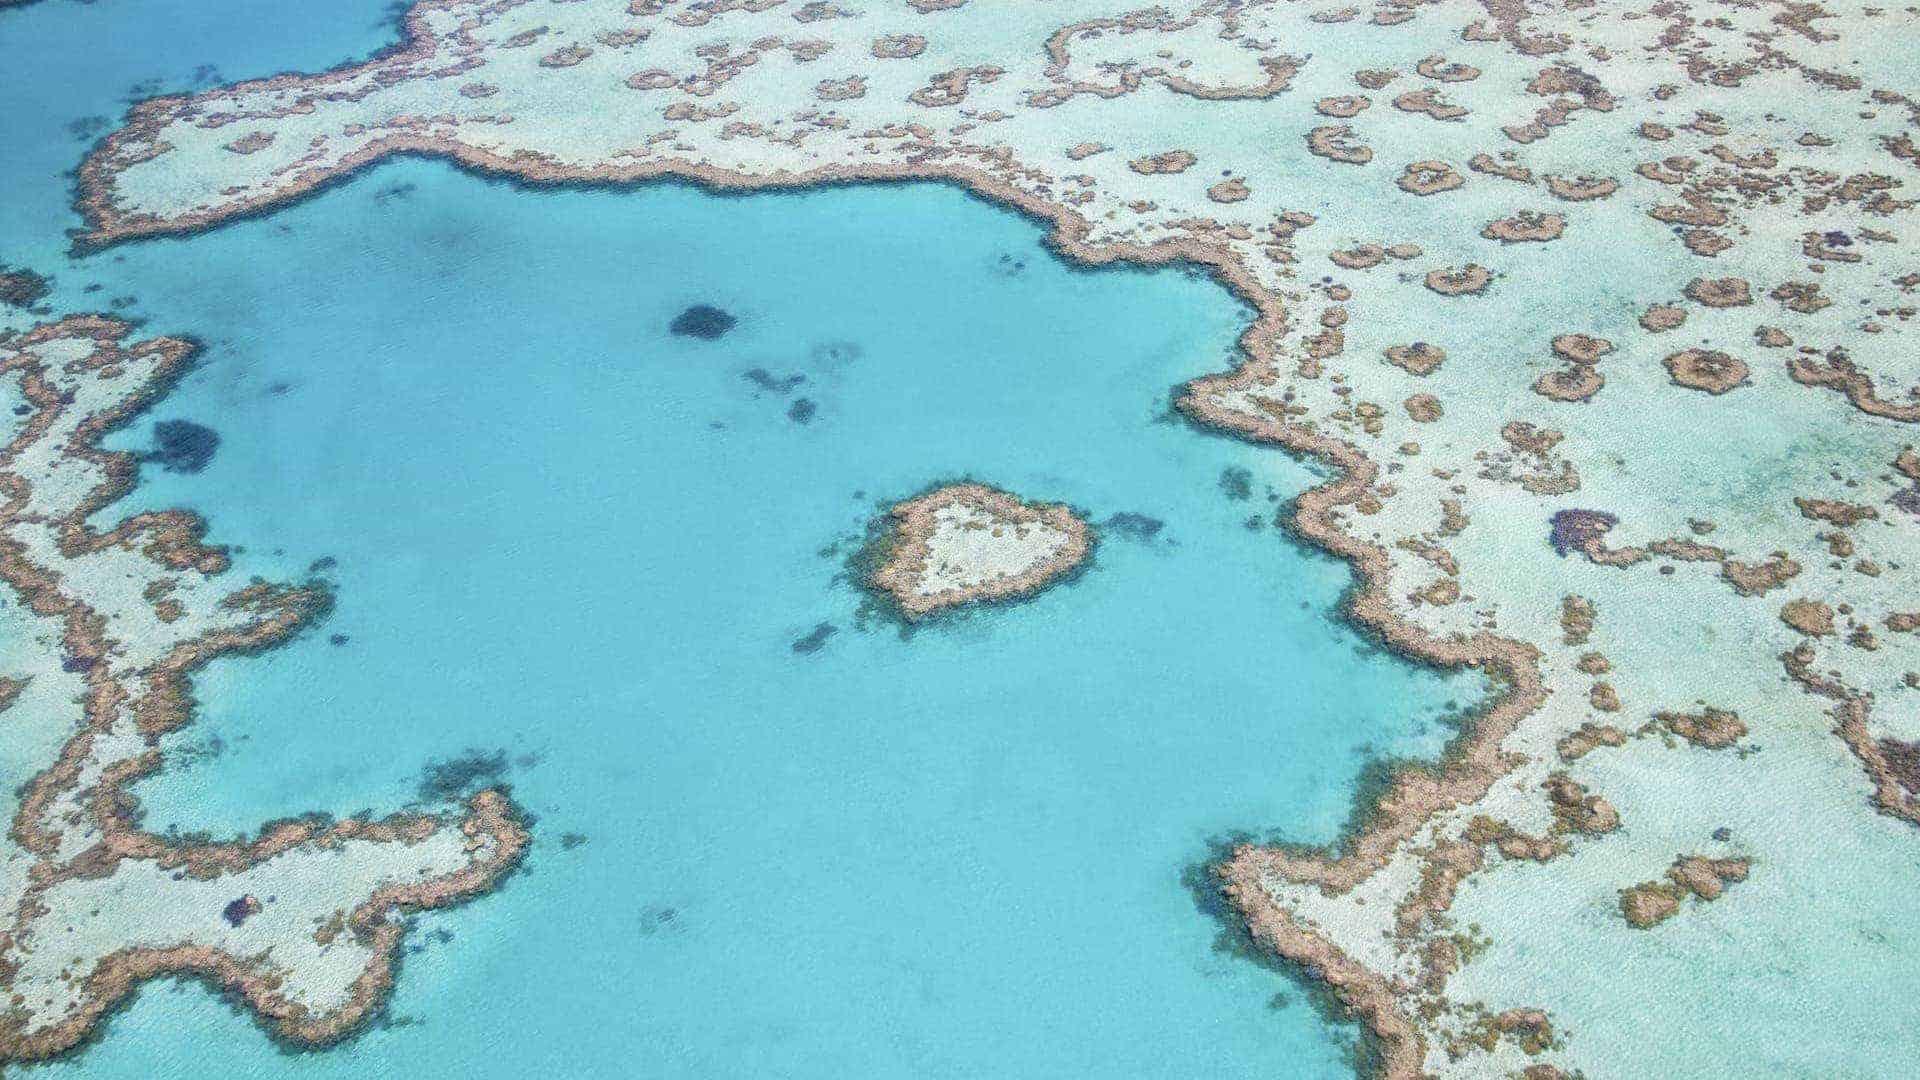 Grande Barriera Corallina, Cairns - Australia